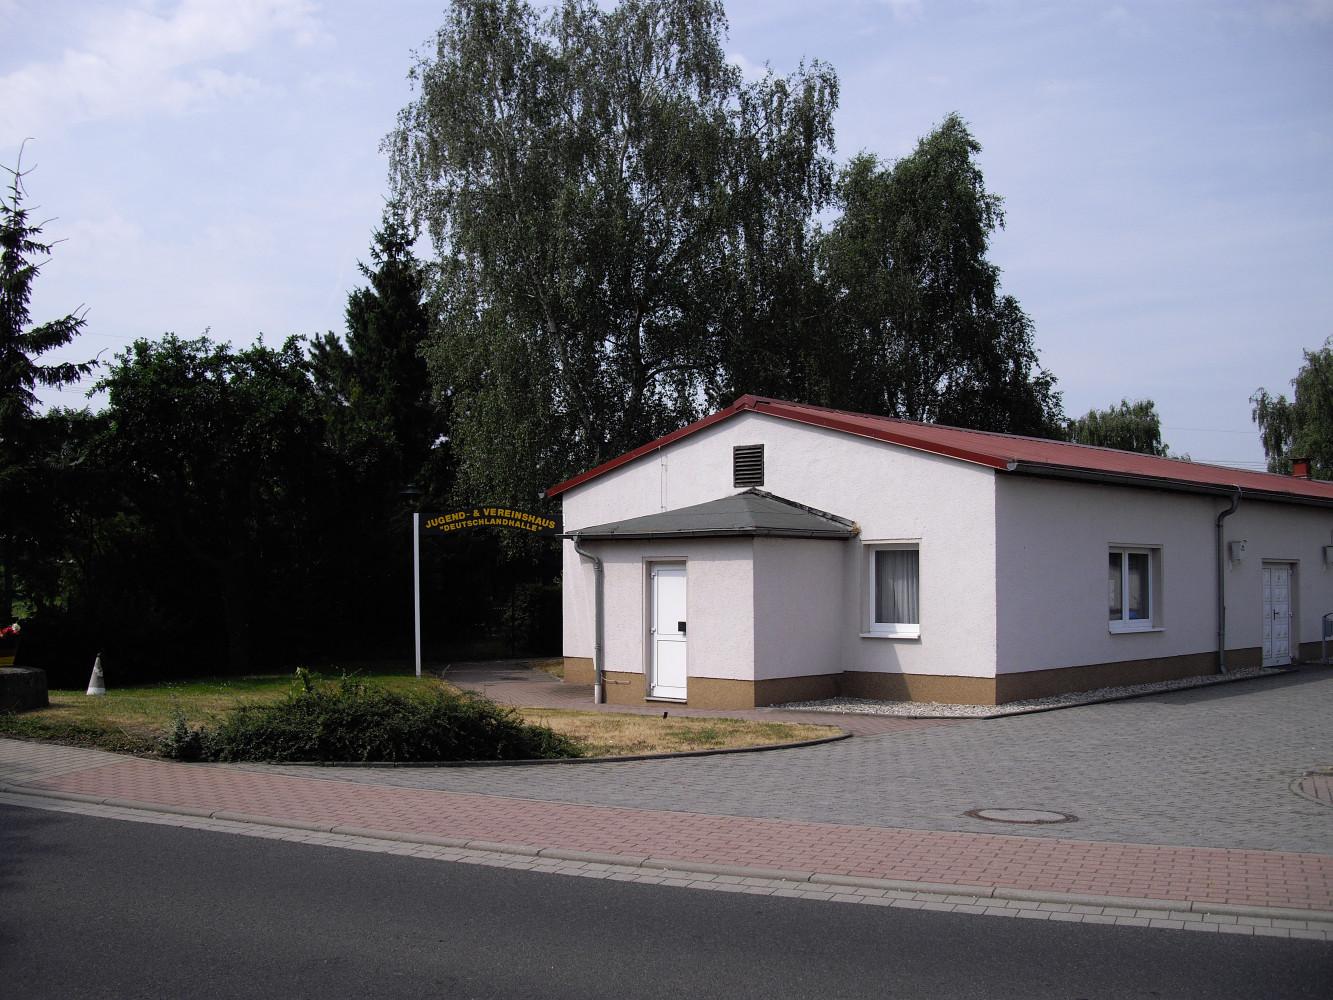 Verinshaus Lippendorf